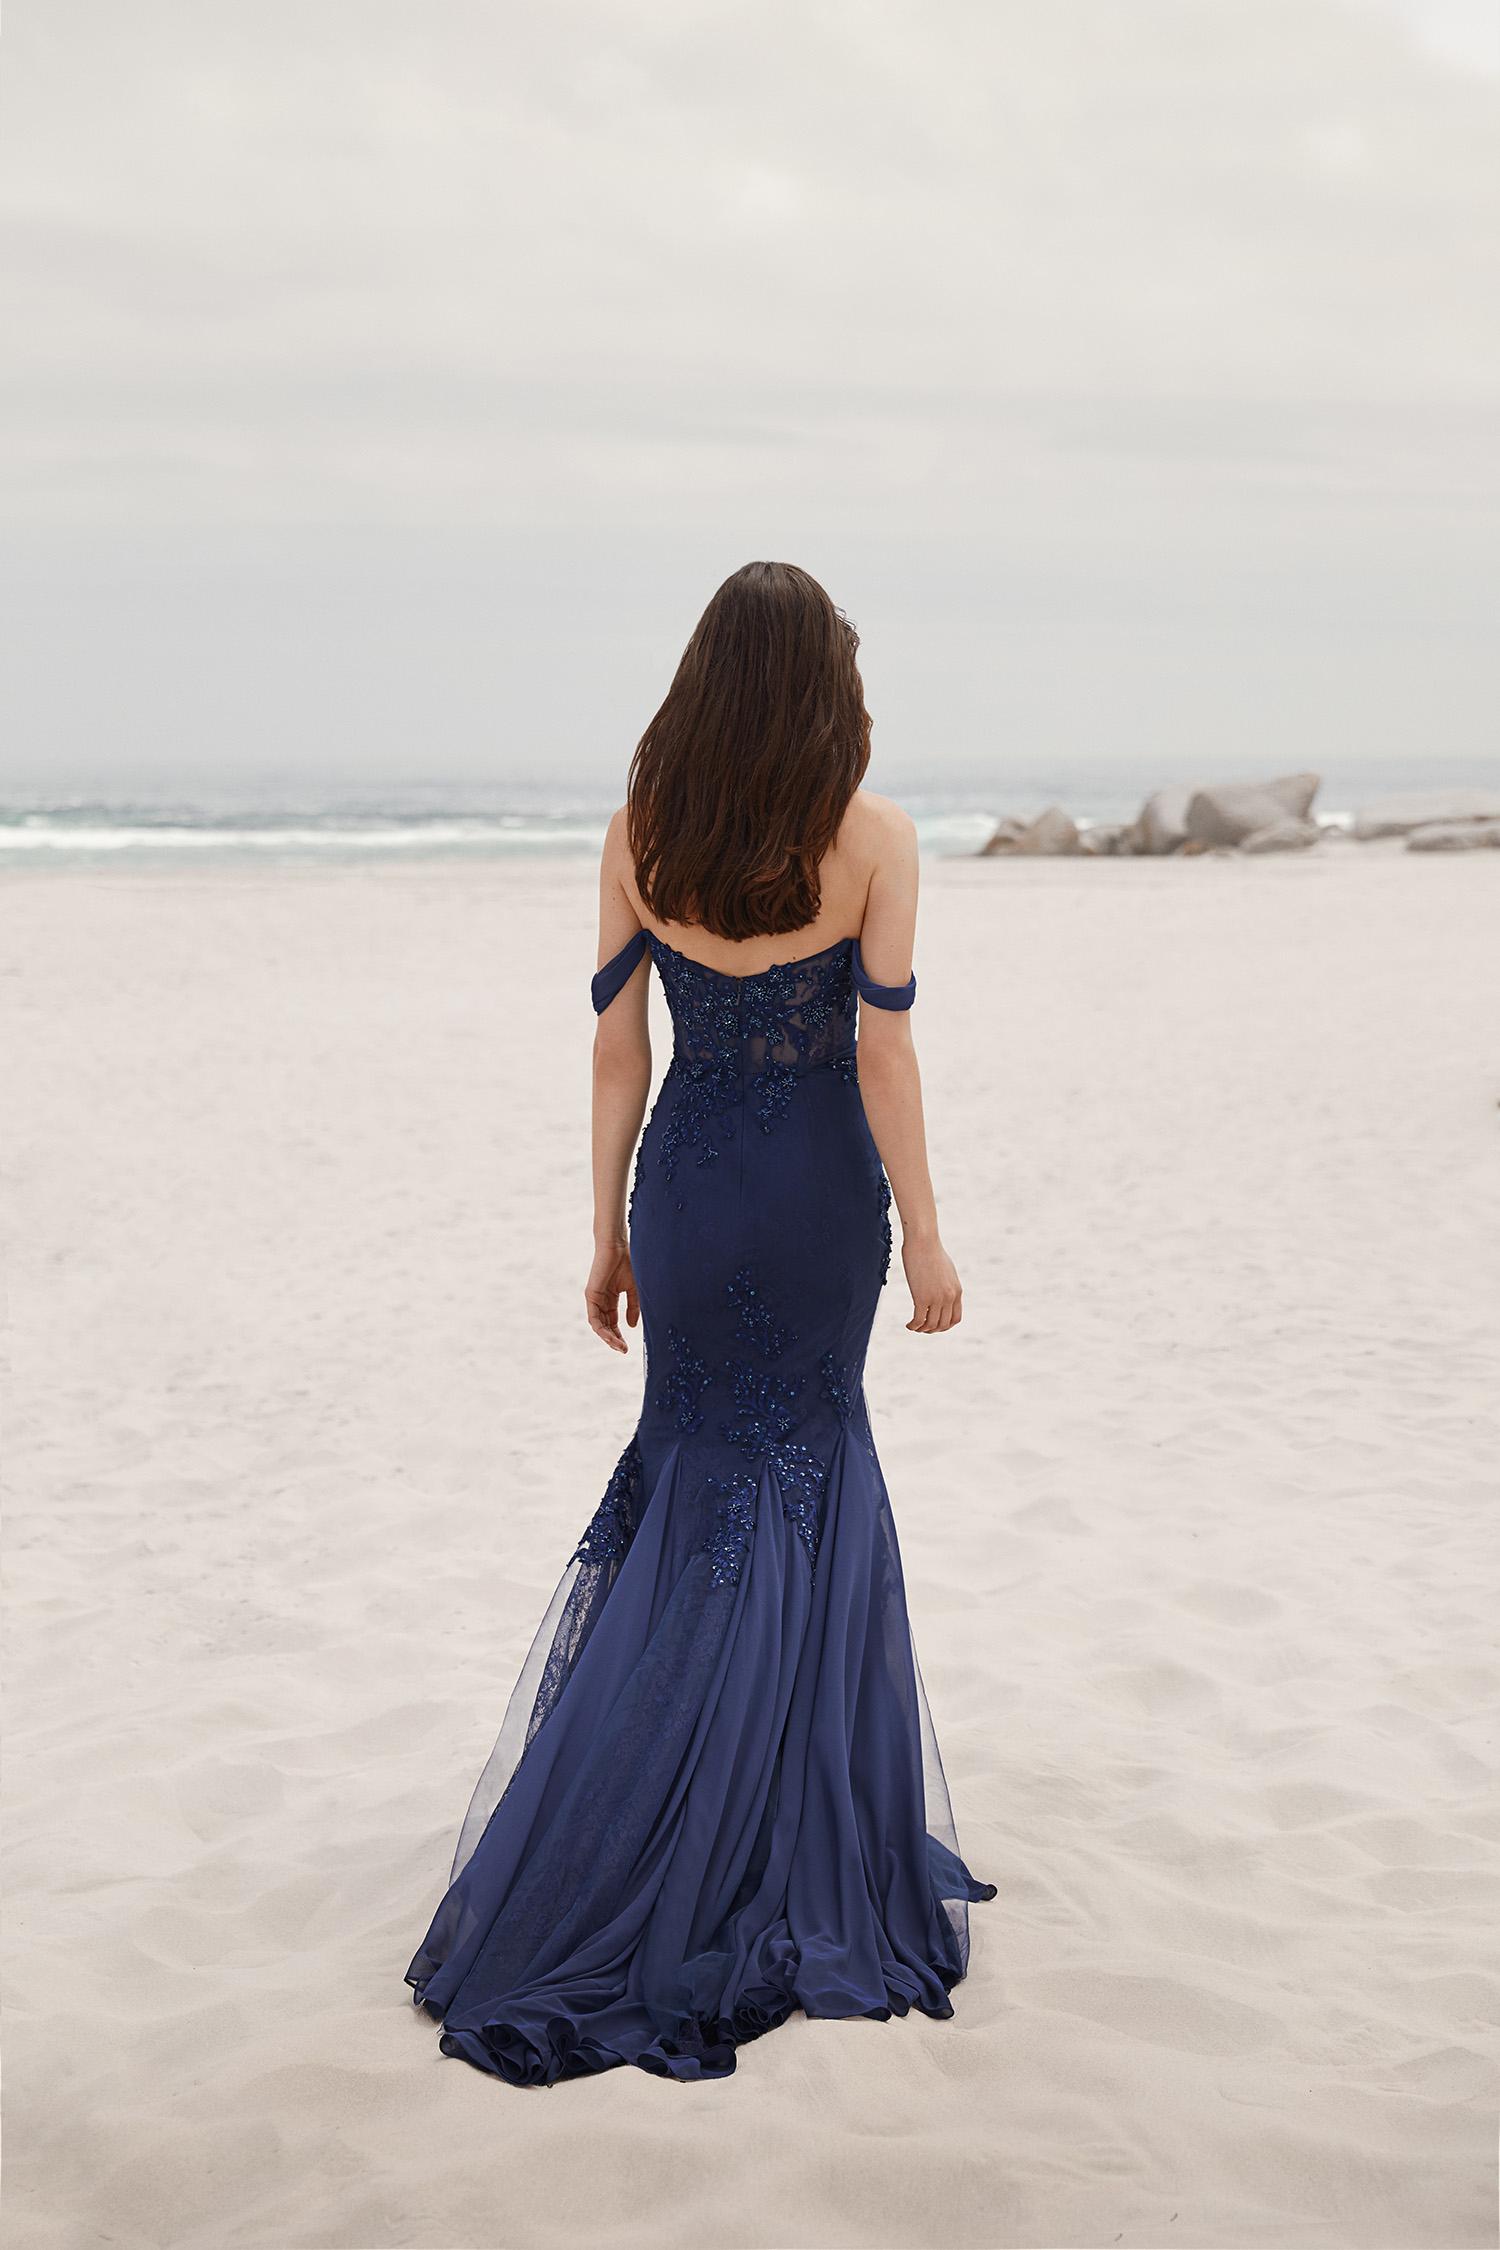 Lacivert Askılı Payet İşlemeli Abiye Elbise - Thumbnail